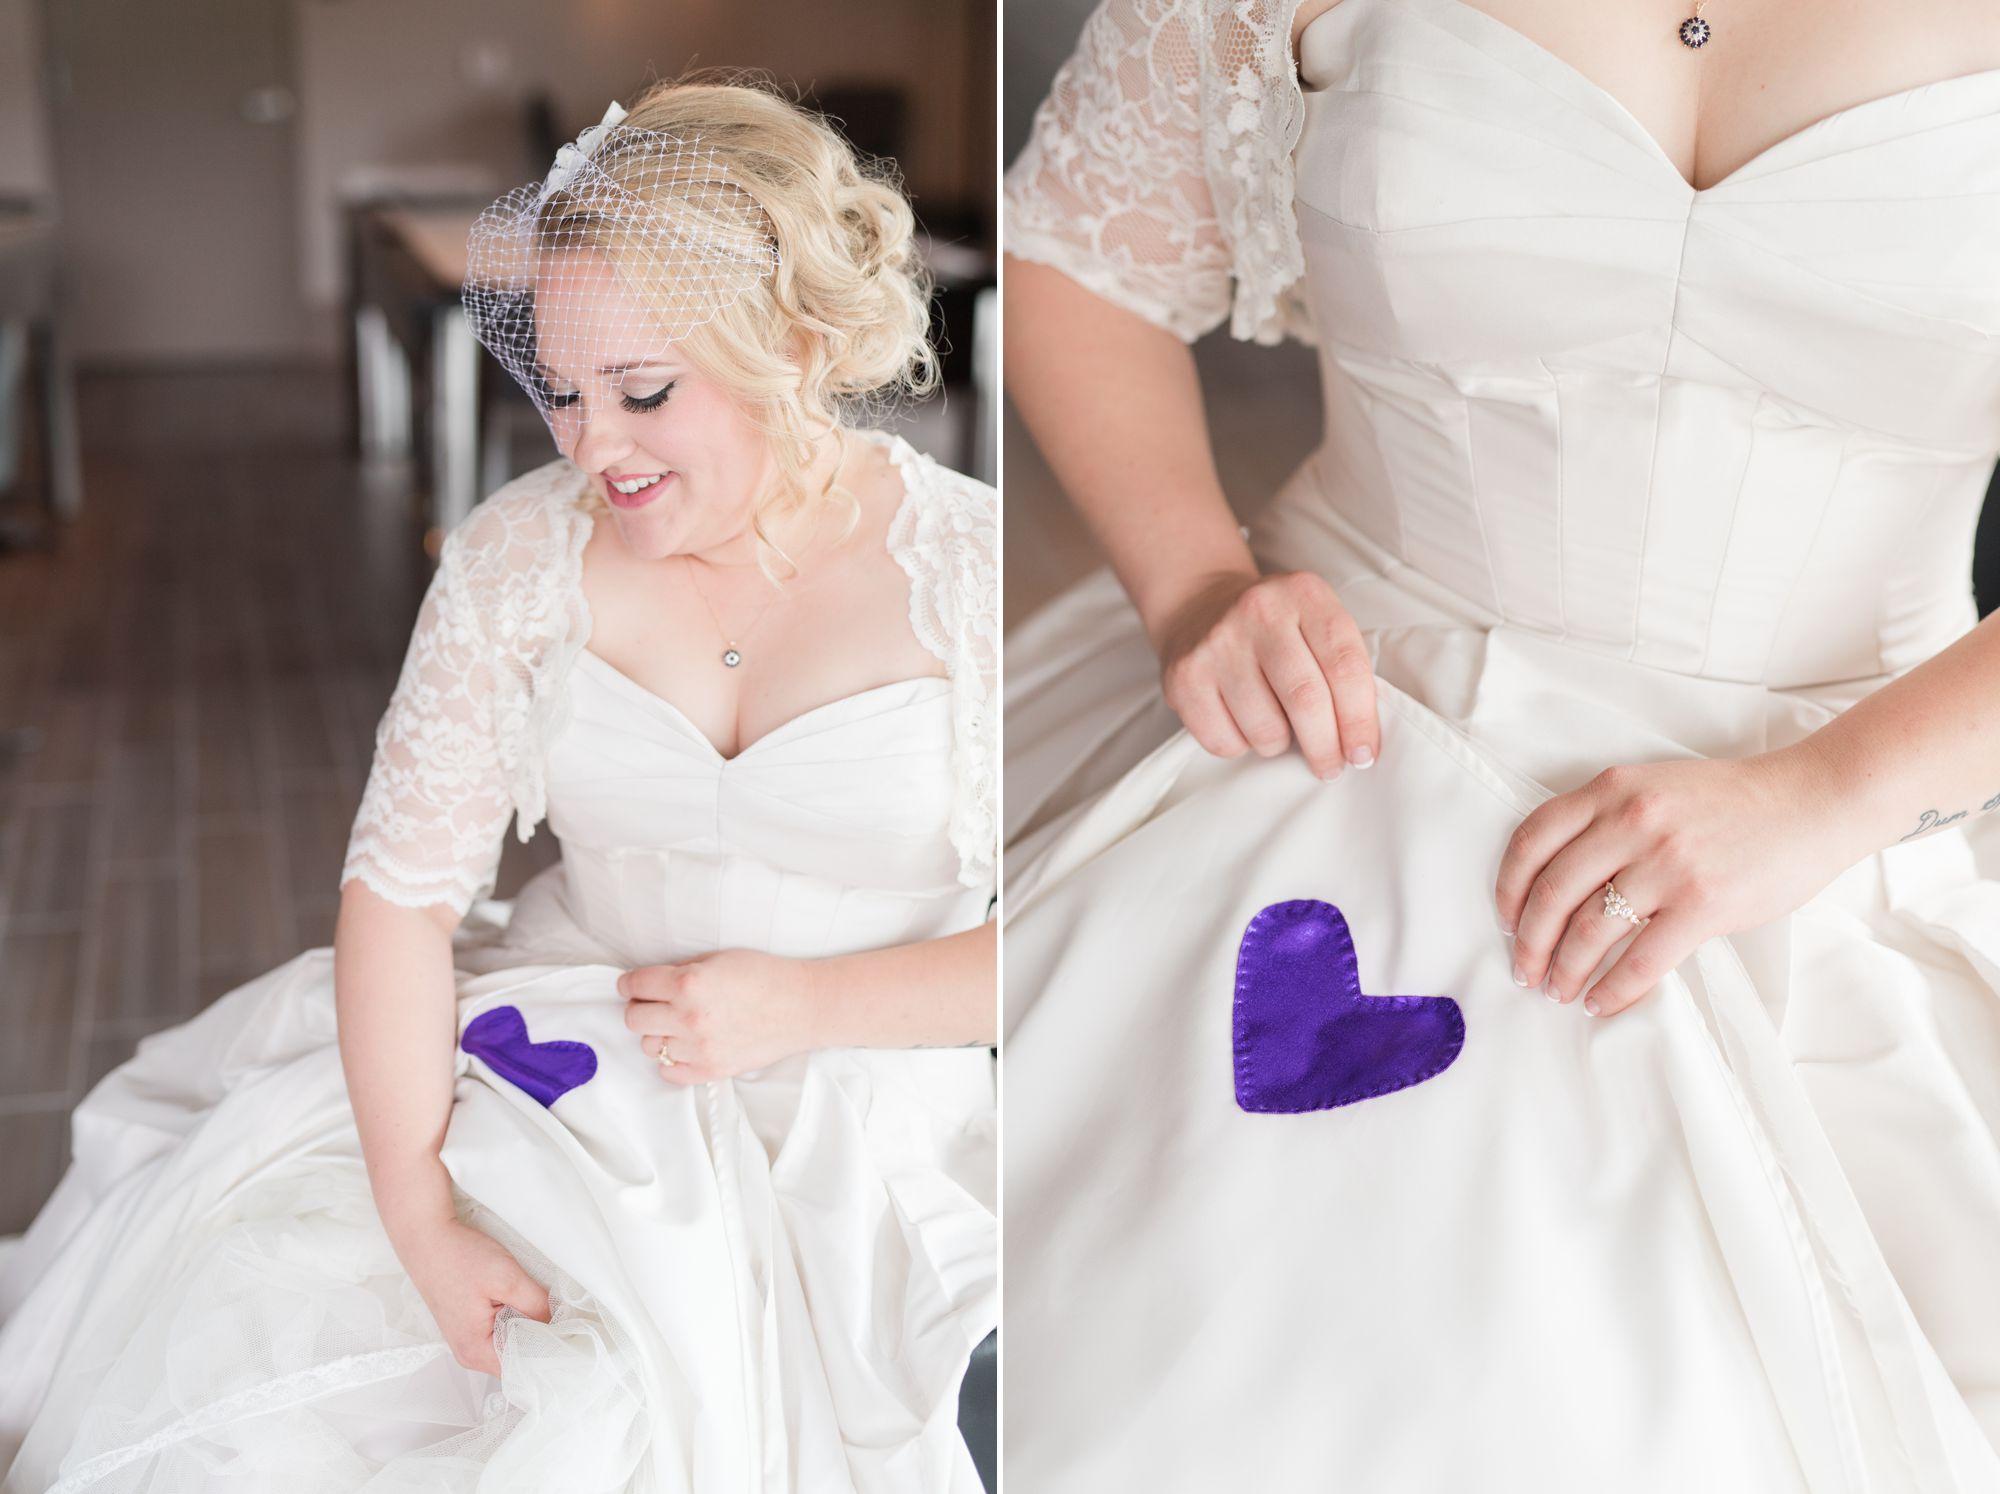 uptown-charlotte-warhouse-wedding 16